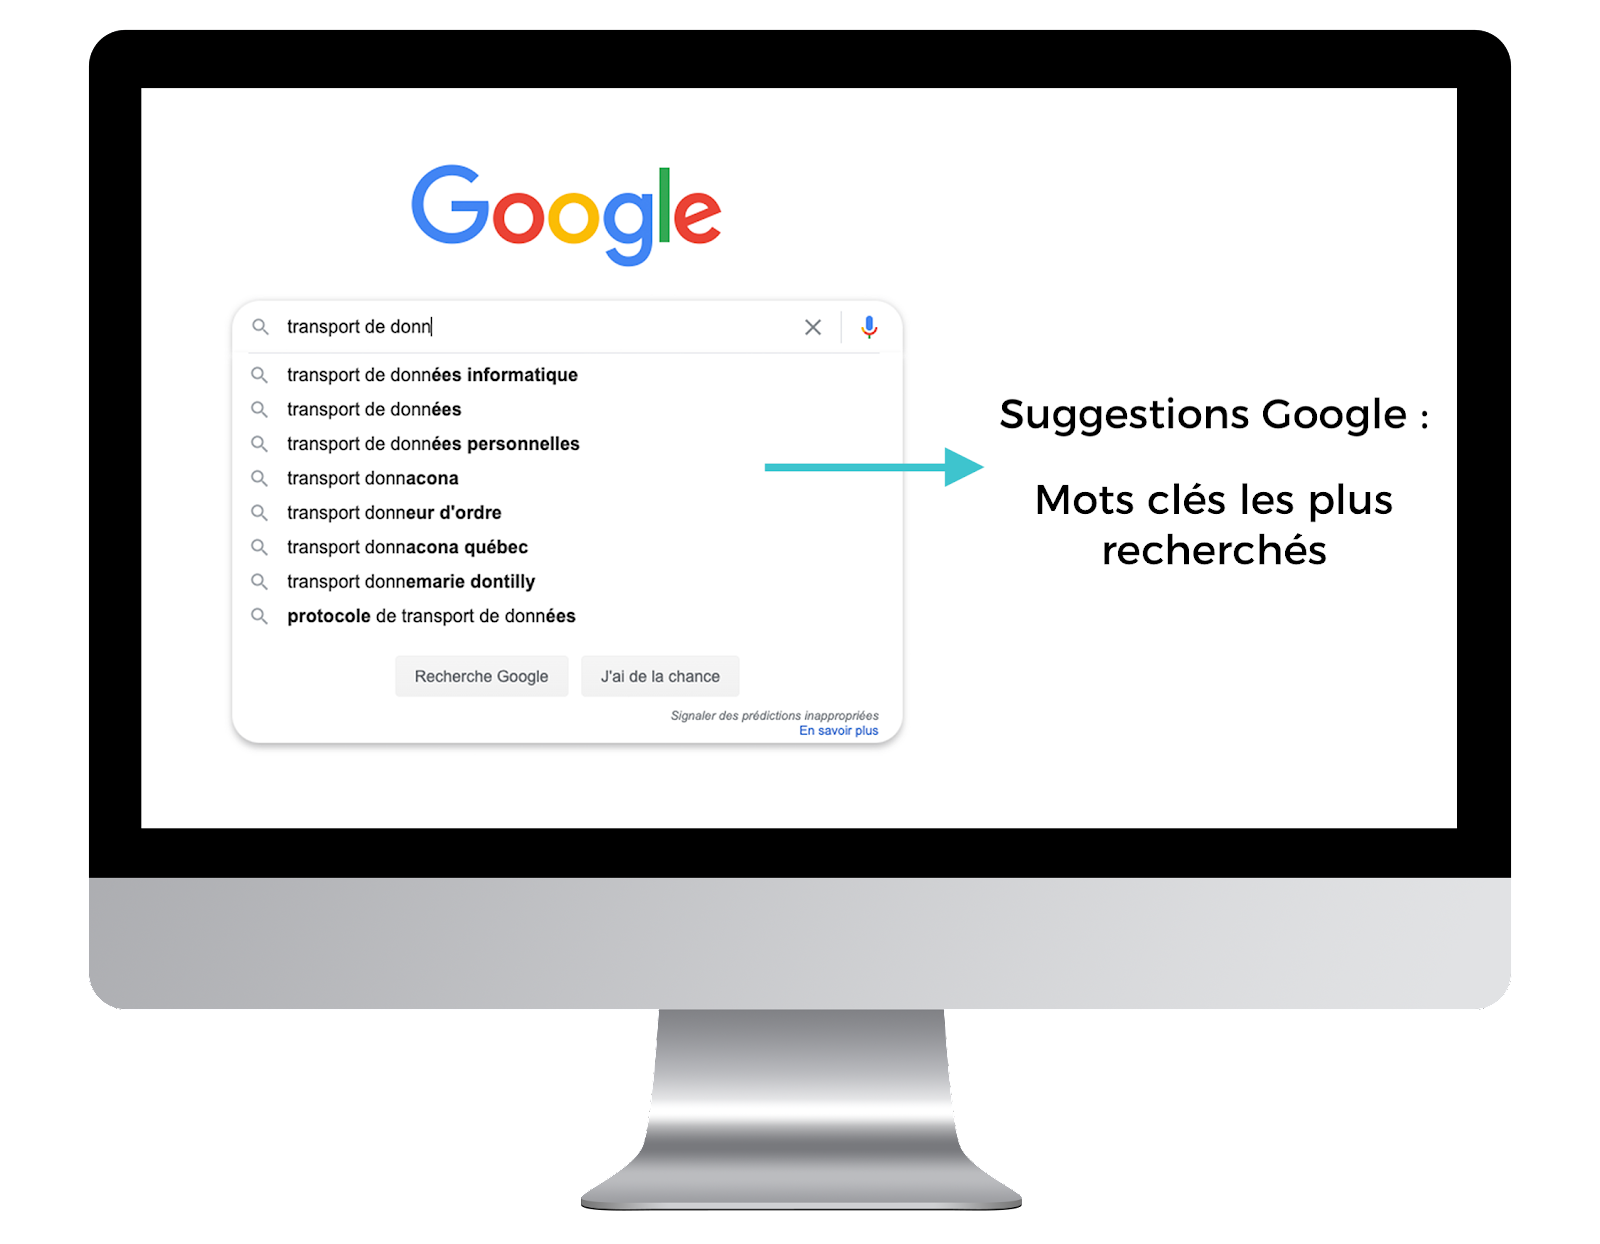 Image schéma Google Suggest SEO